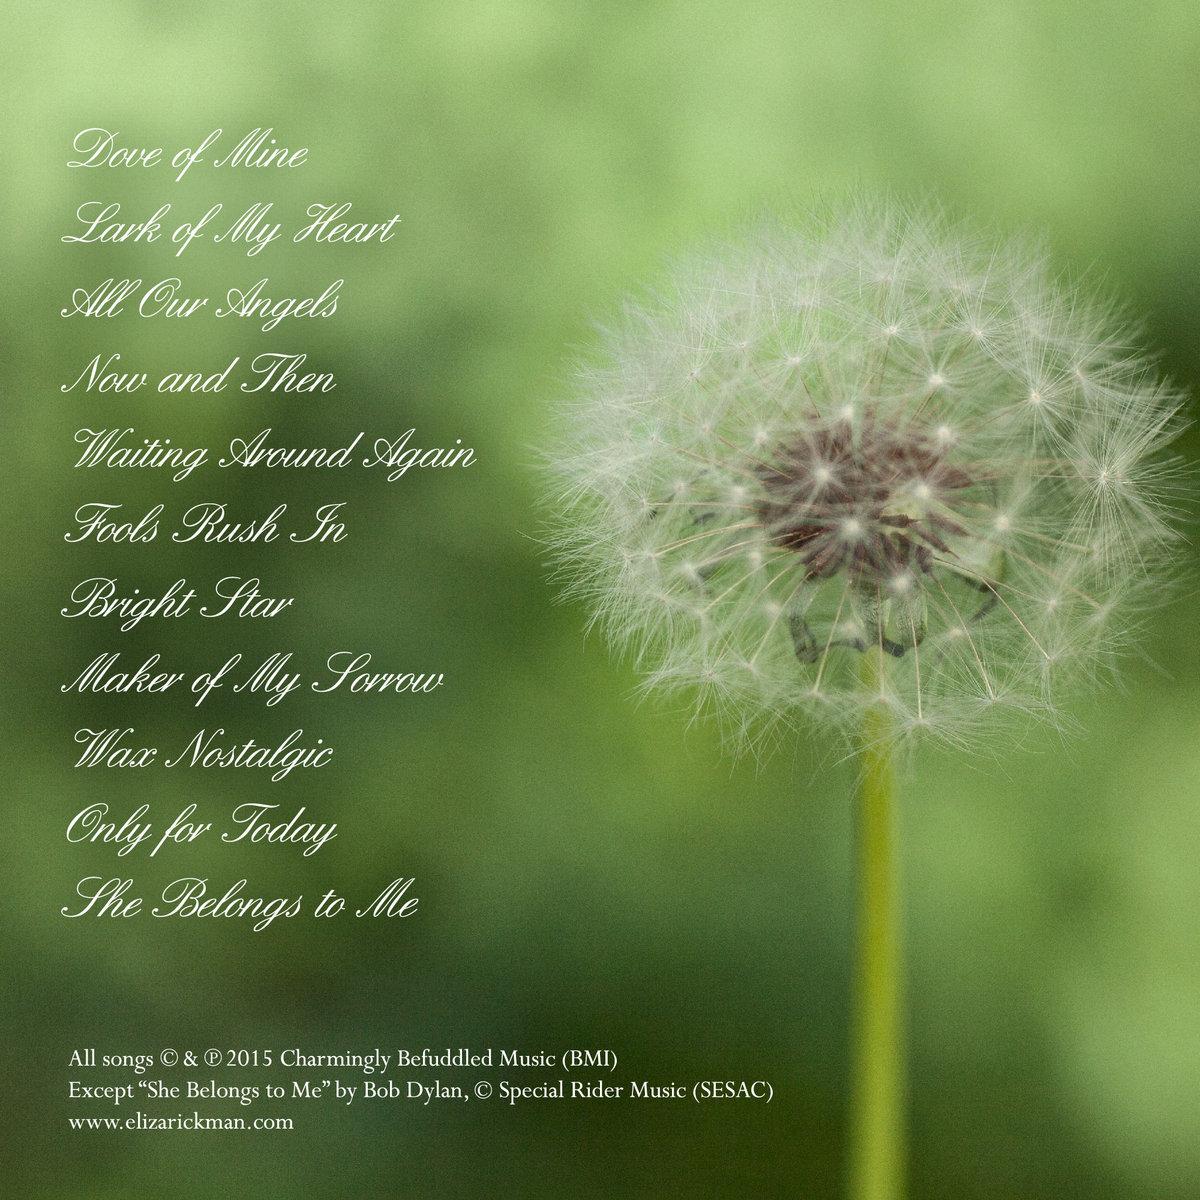 Dove of Mine | Eliza Rickman